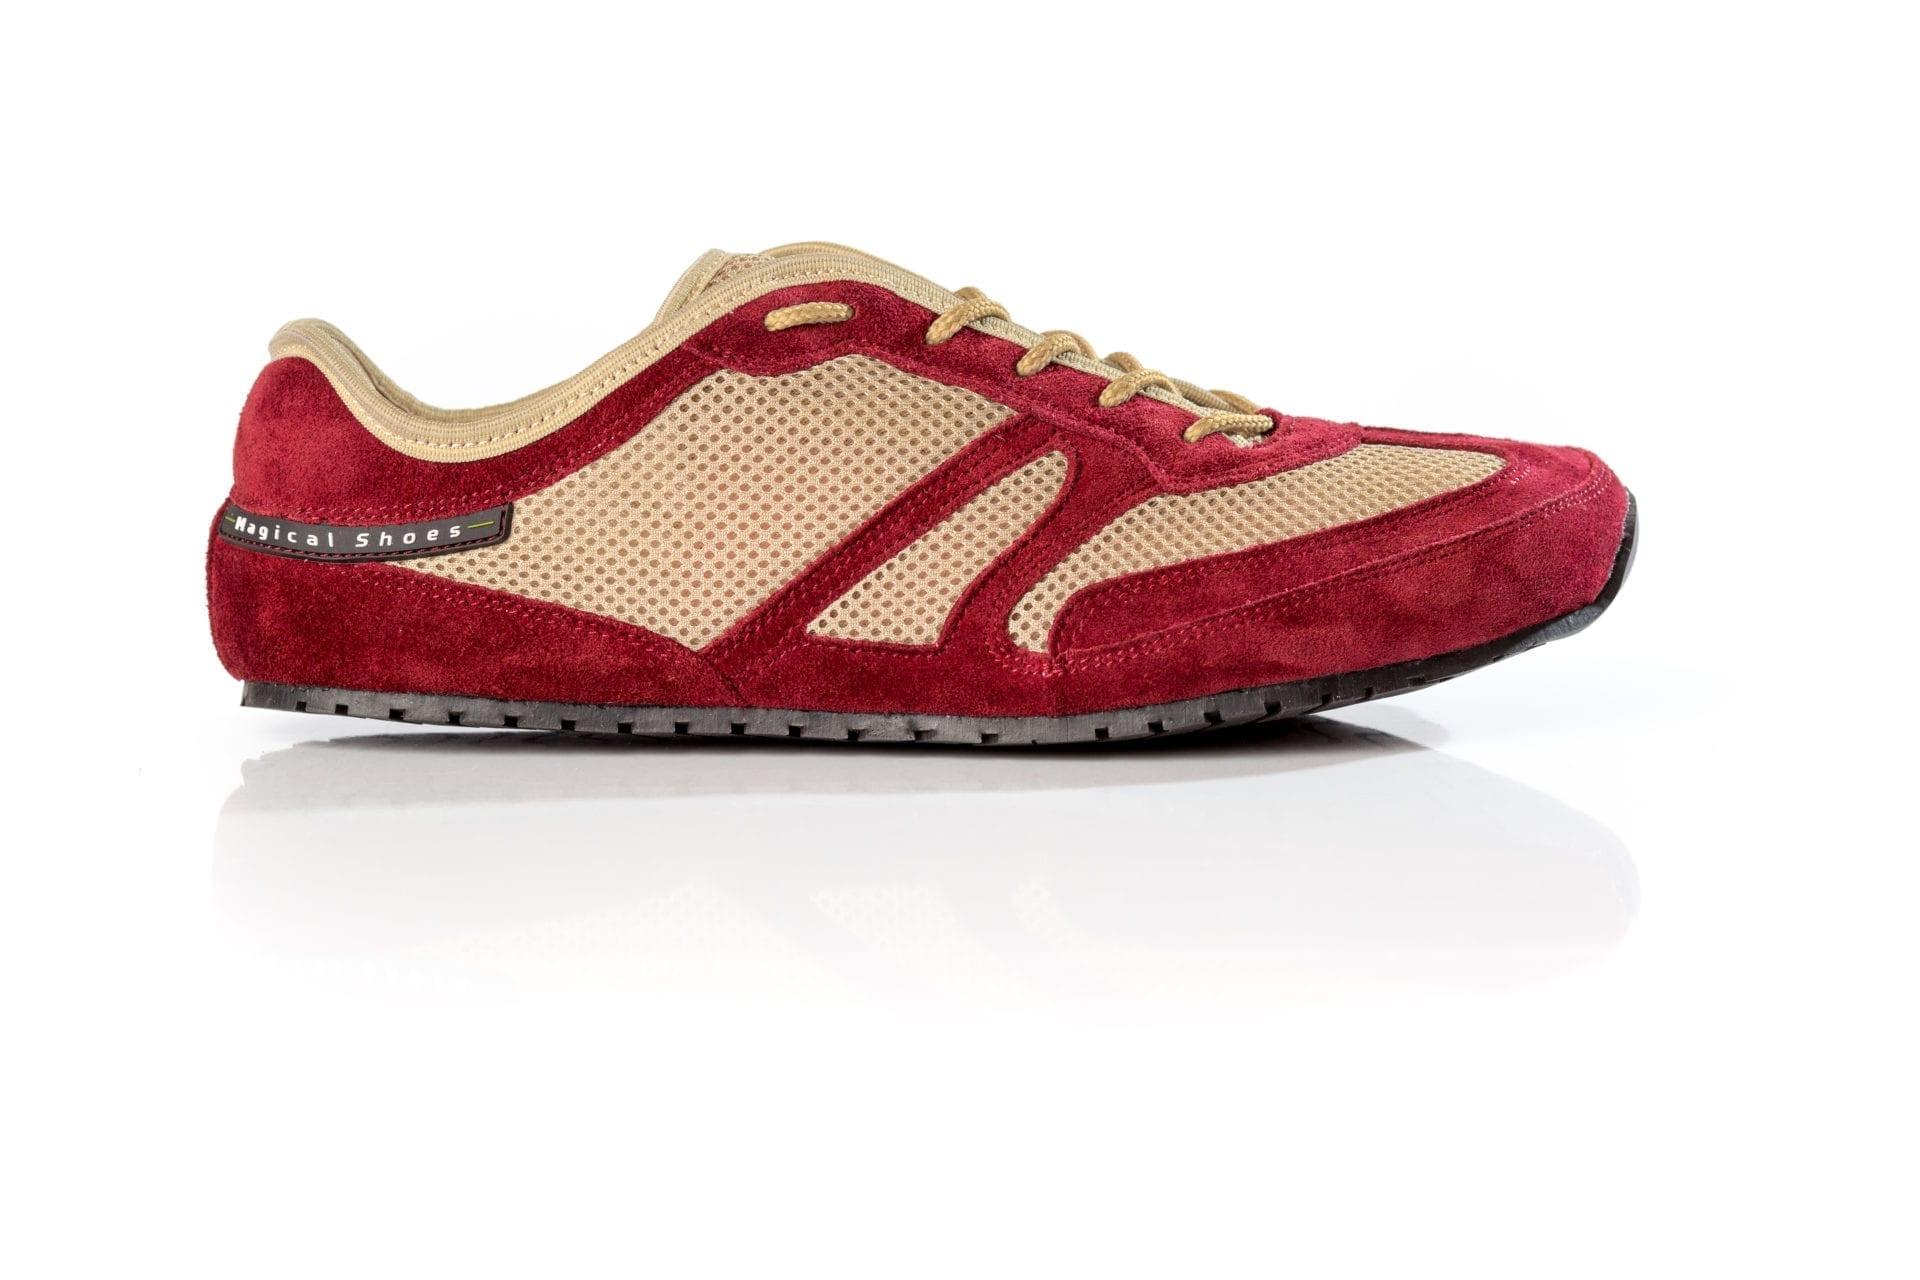 Magical Shoes EXPLORER – FRUITY CLARET BAREFOOT SHOES picture 4